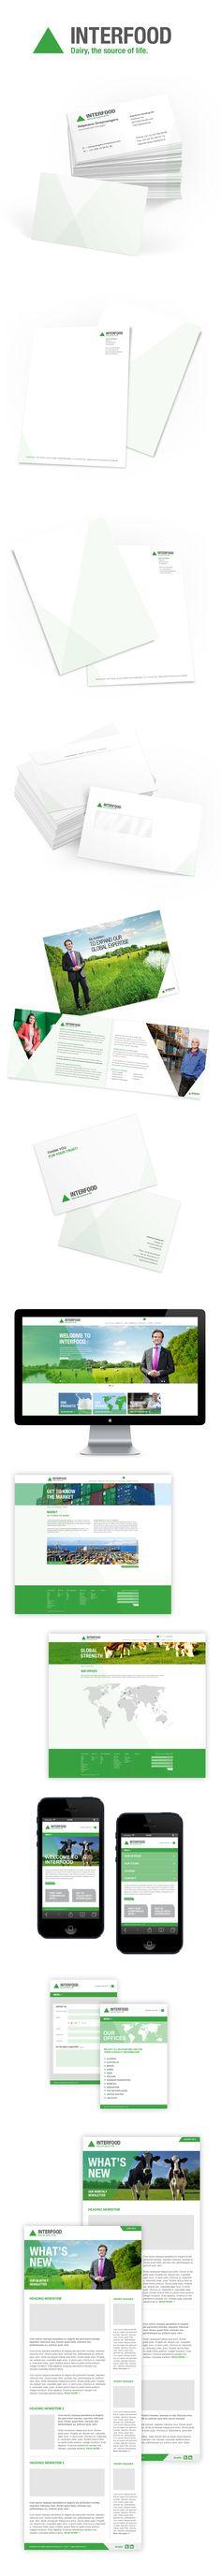 Interfood Logo design, corporate identity, website by GiDesign Corporate design letterhead letter business card logo envelop colors graphic minimal website